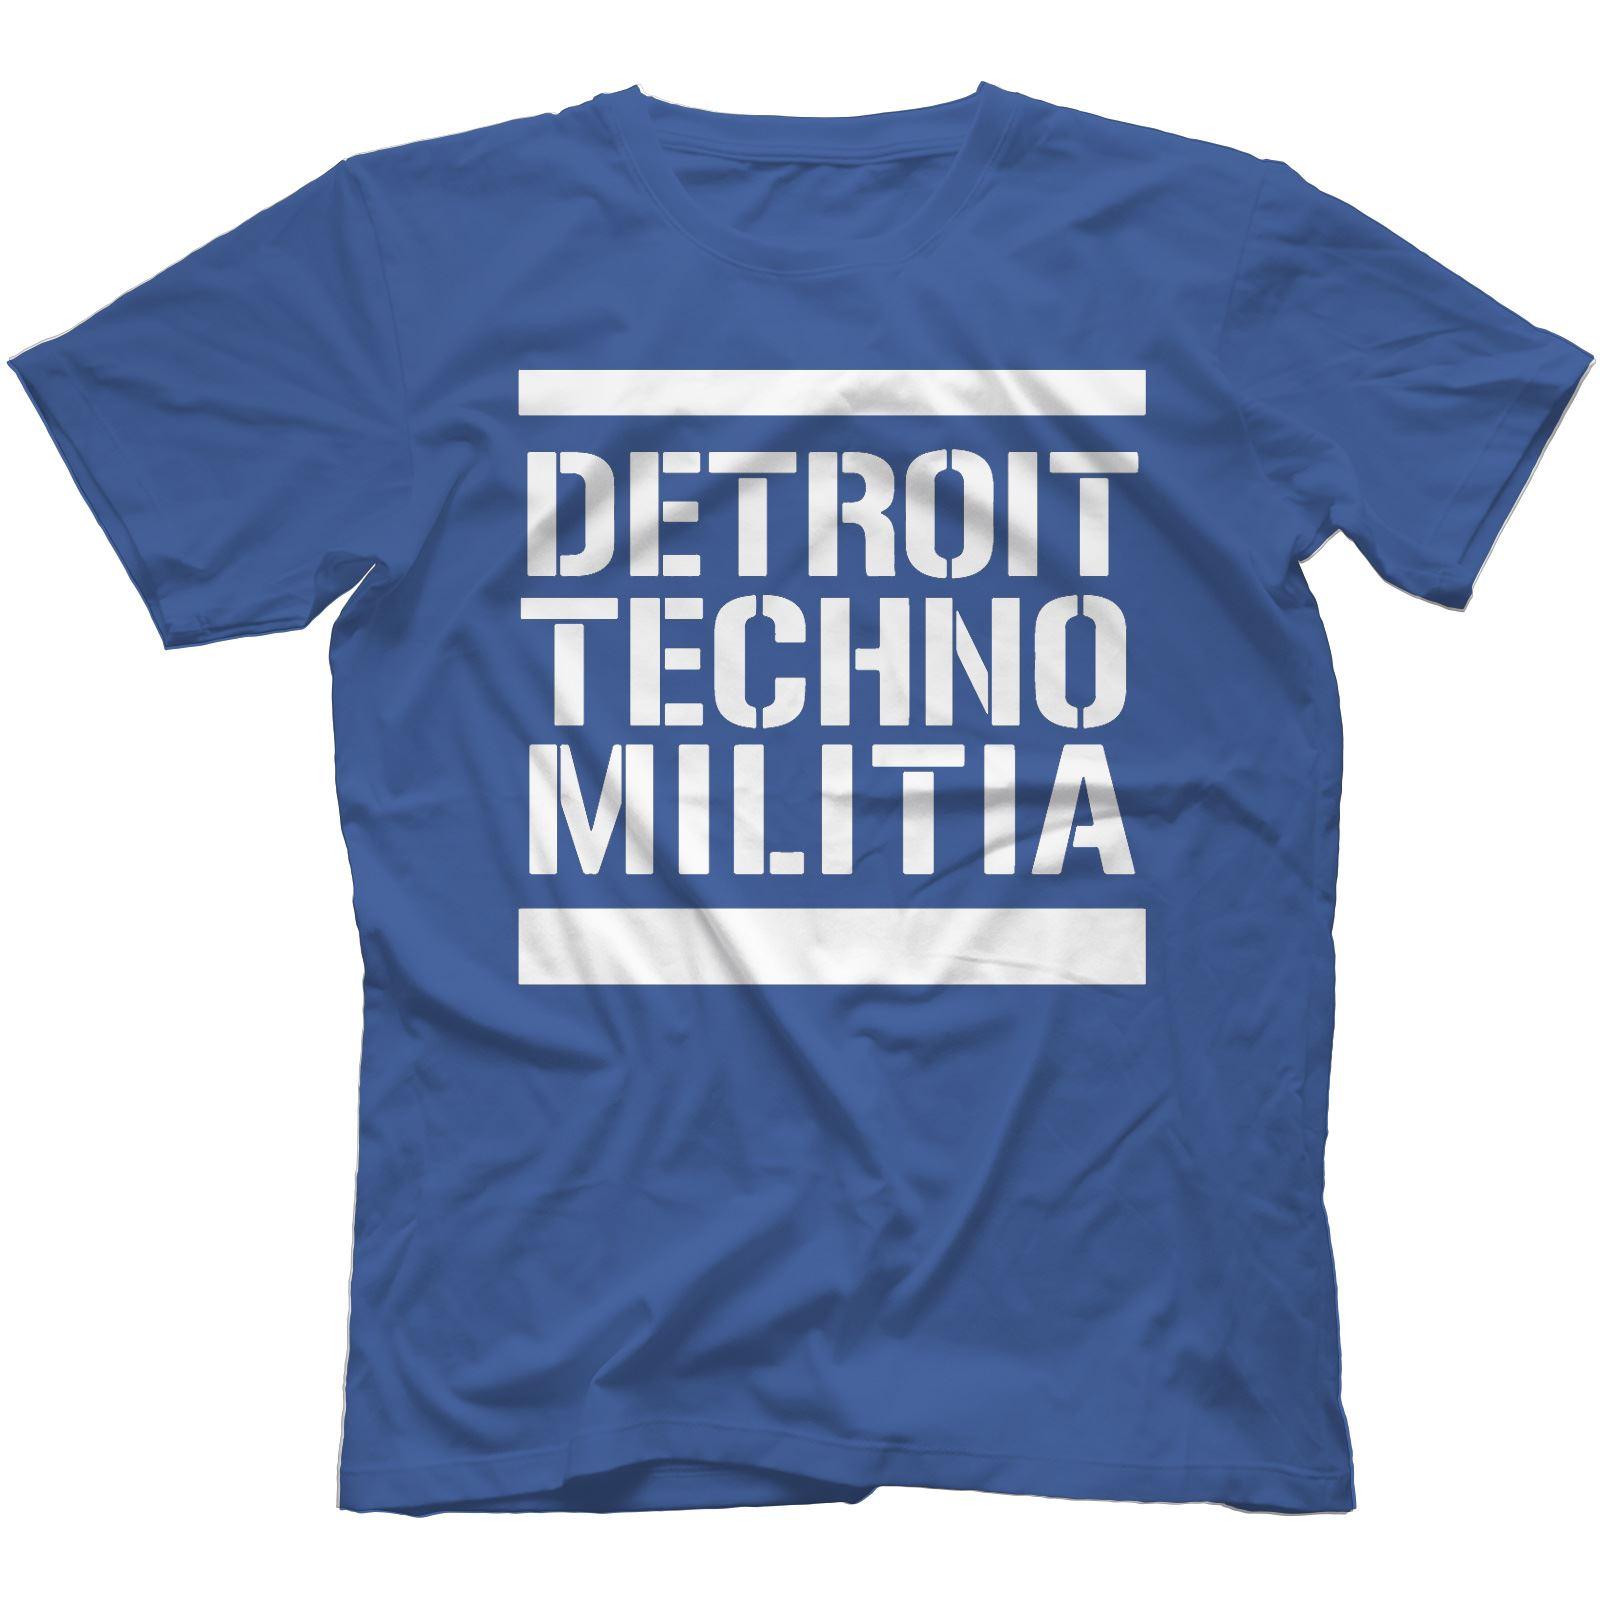 Detroit-Techno-Militia-T-Shirt-100-Cotton-Vinyl-909-Underground-Resistance Indexbild 35